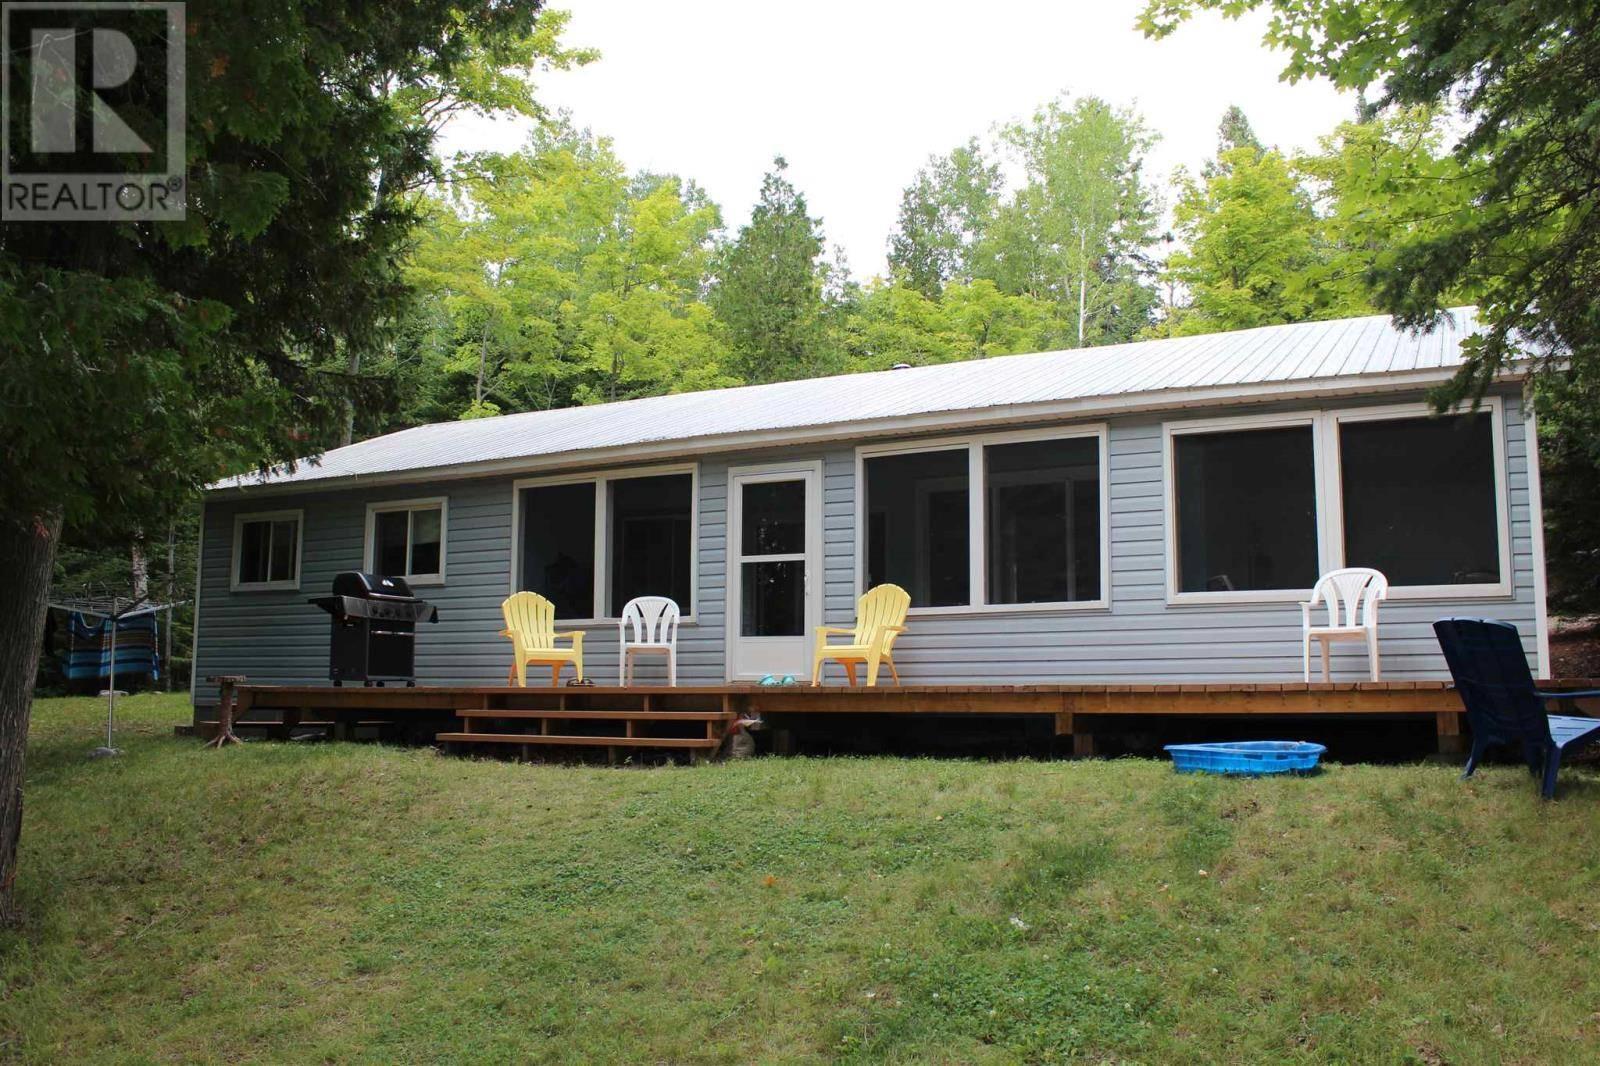 Residential property for sale at 5253 Ellwood Blvd St. Joseph Island Ontario - MLS: SM127624